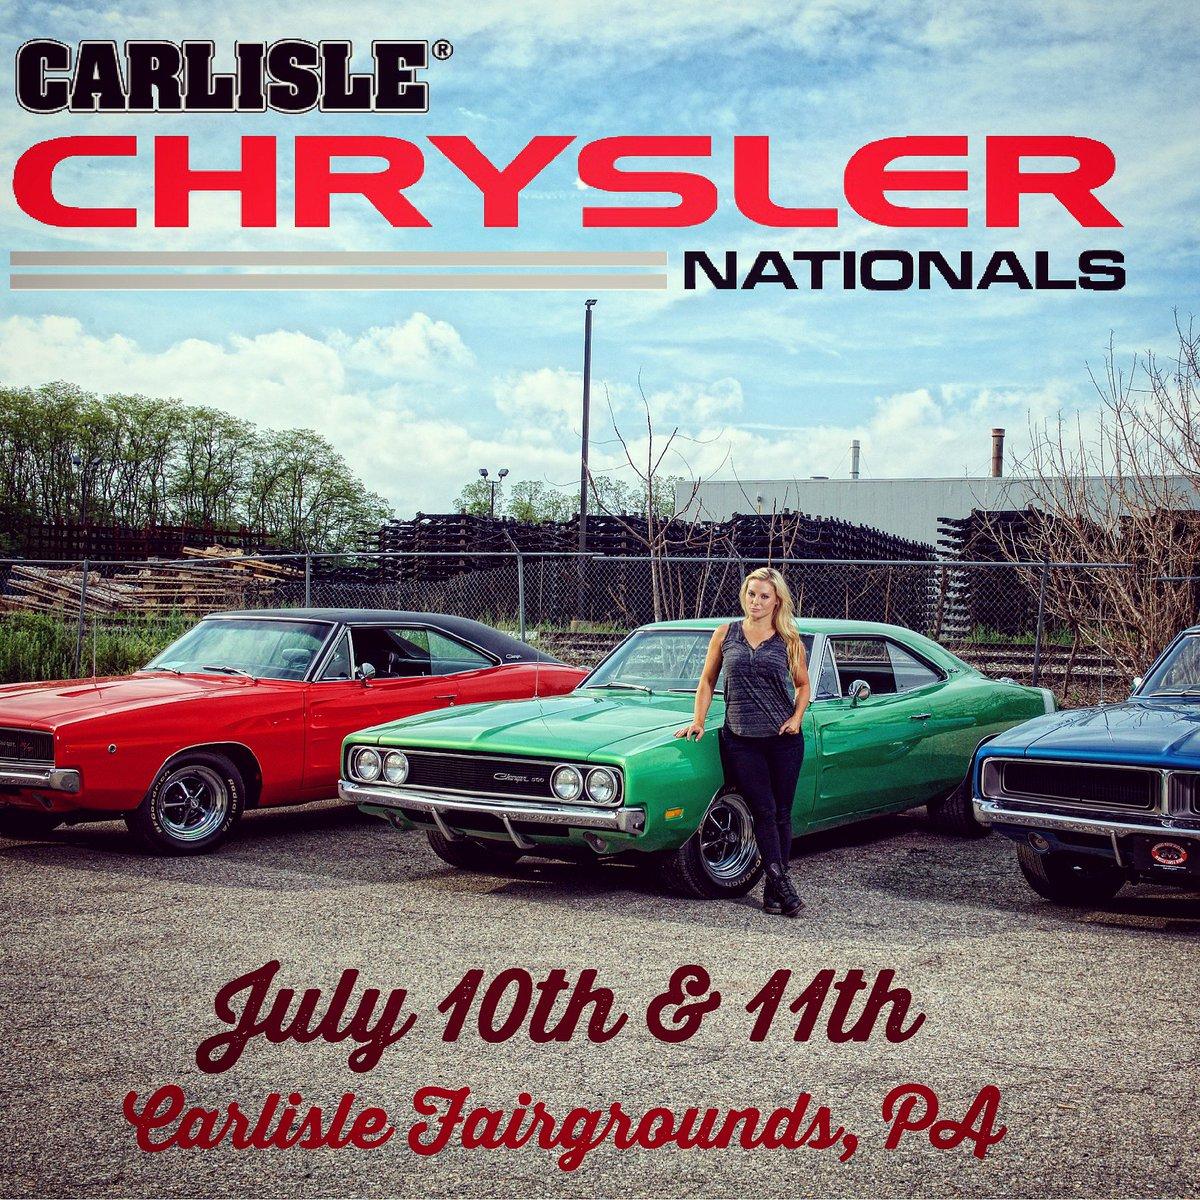 Headed to #CarlisleChryslerNationals tomorrow & Saturday - see ya there!!! 👋 #mopar #chryslernats https://t.co/MbvXhaRNPj